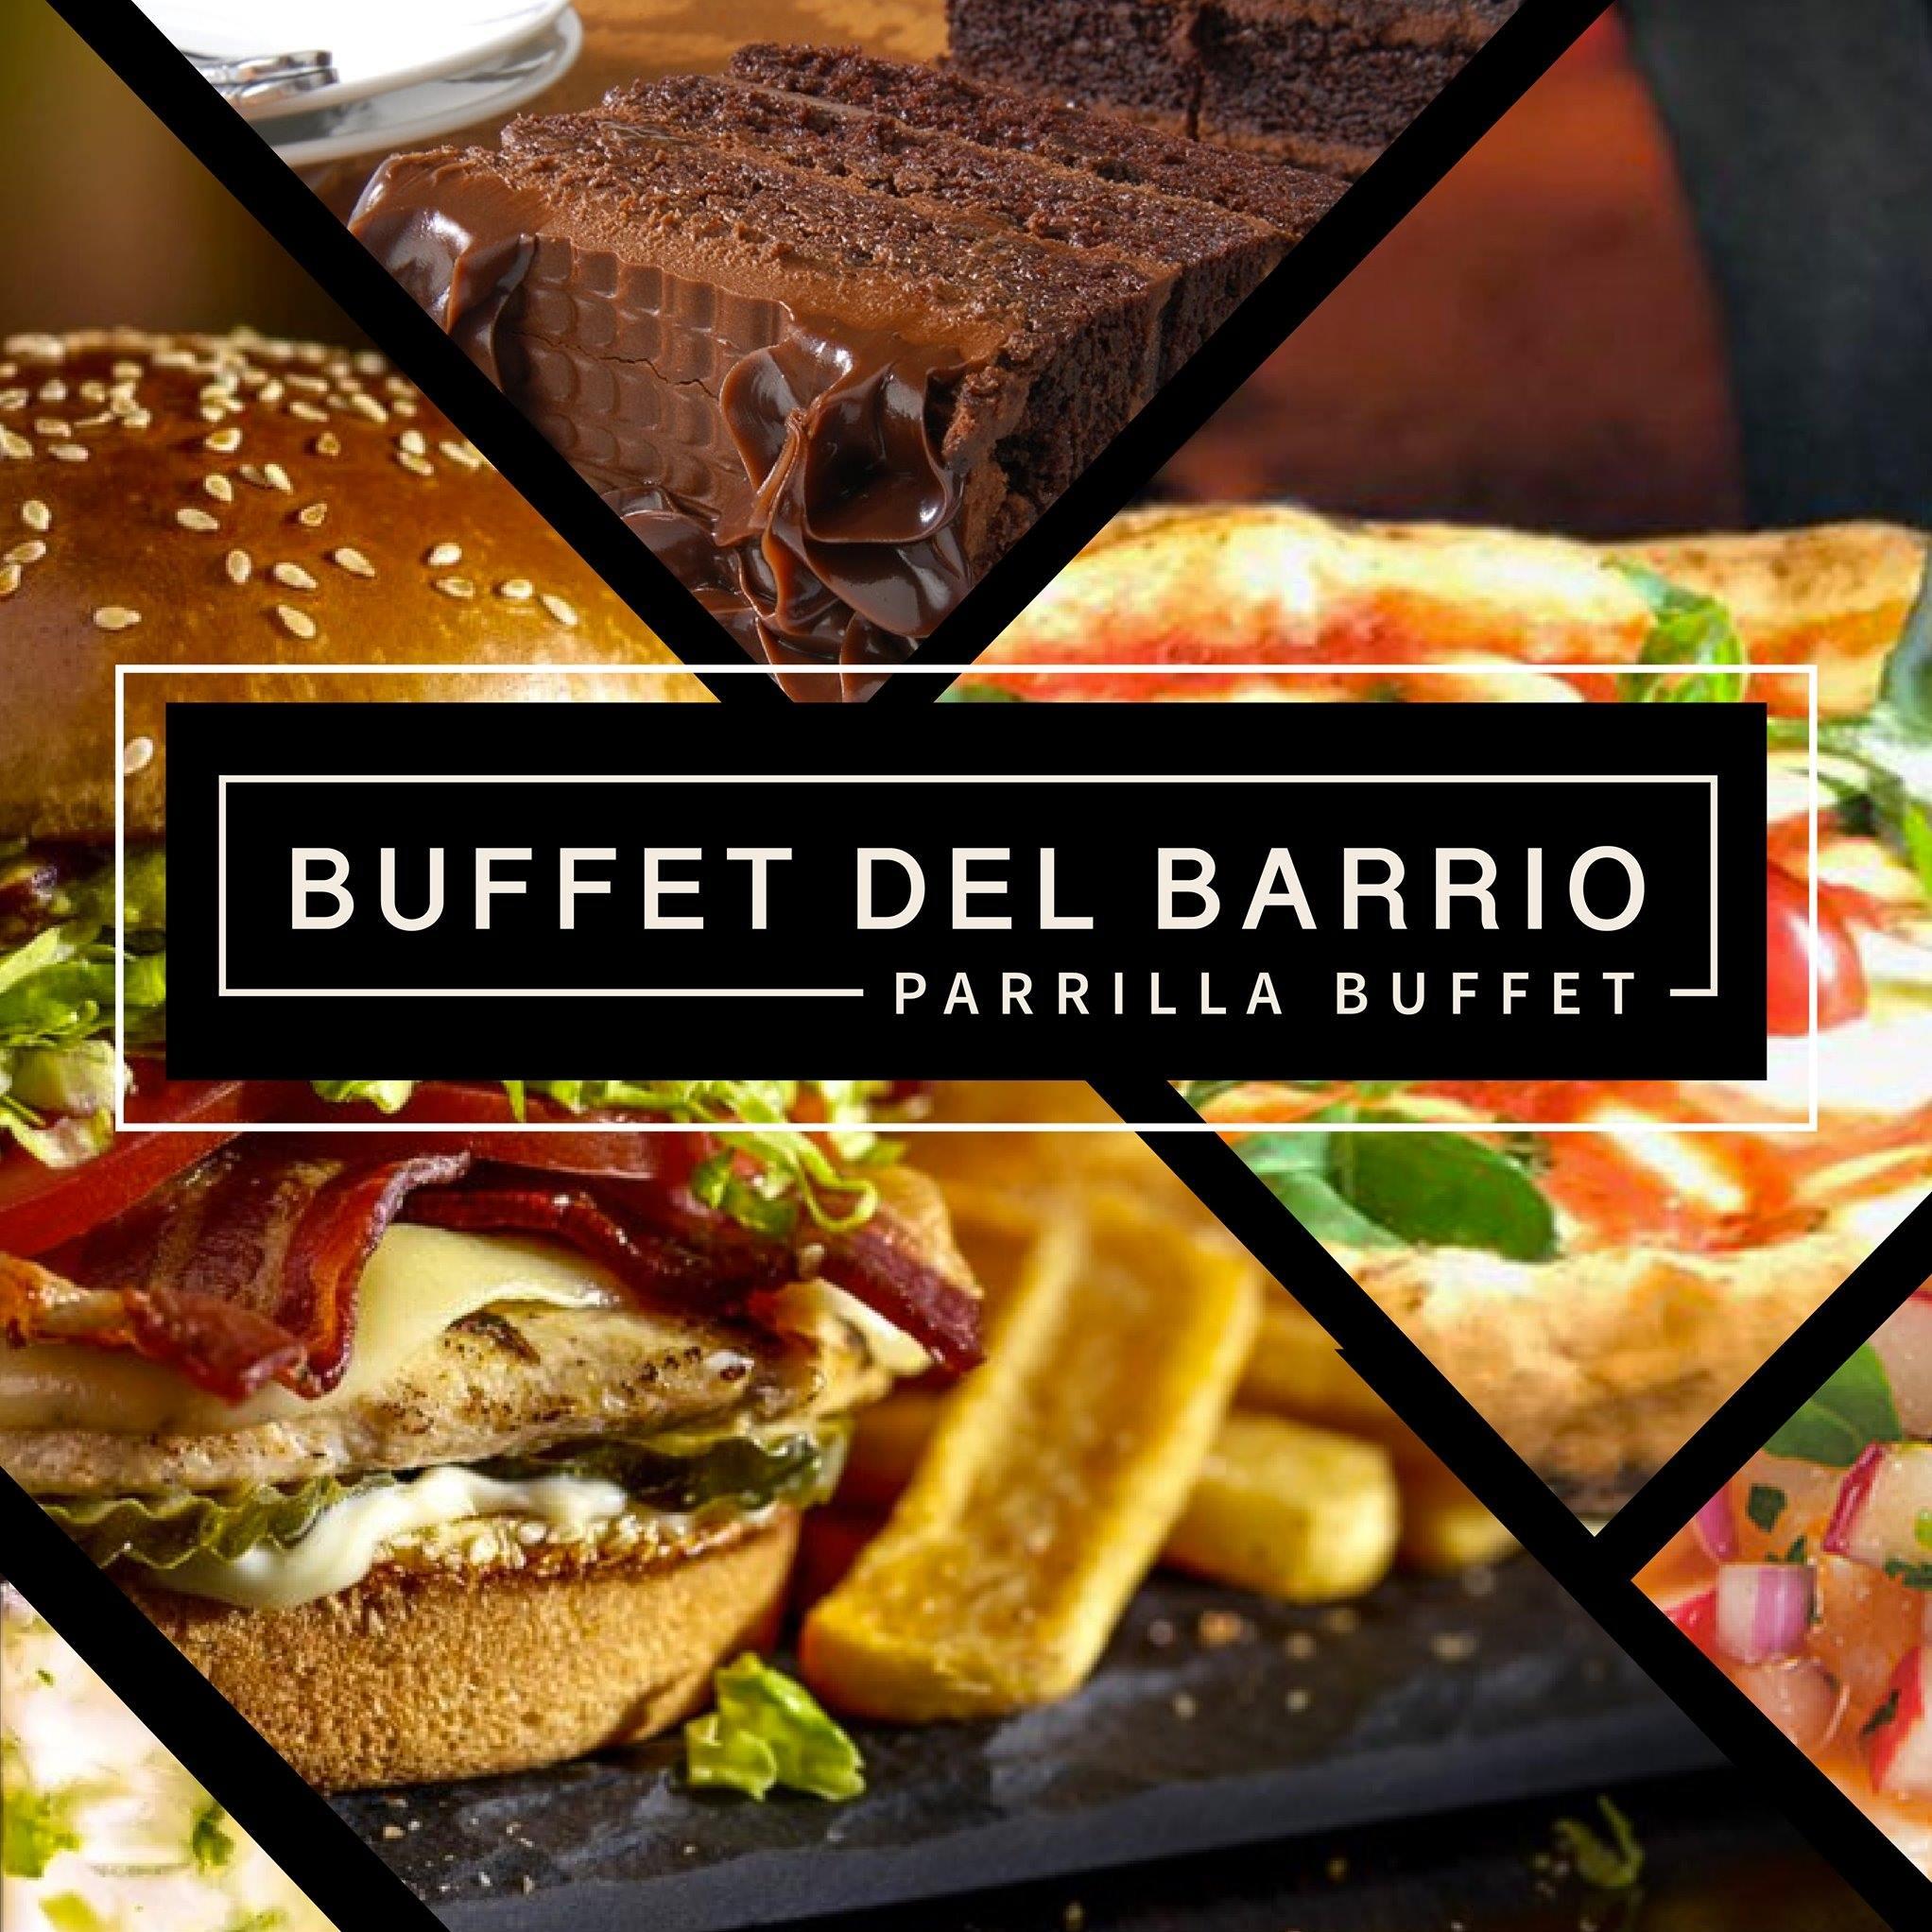 BUFFET DEL BARRIO